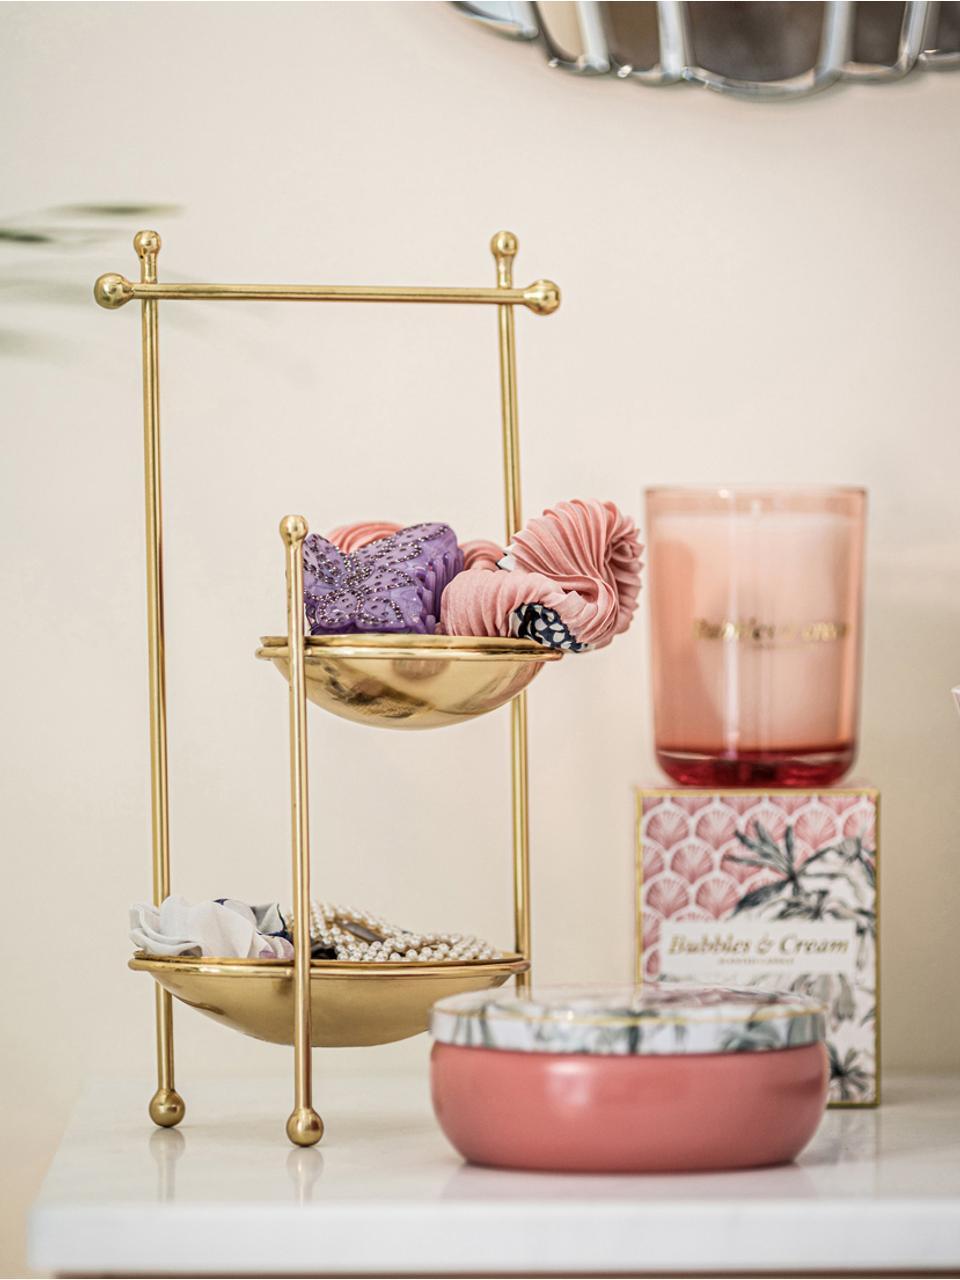 Duftkerze Allure (Tuberose, Jasmin, Zedernholz), Box: Papier, Behälter: Glas, Rosa, Mehrfarbig, 9 x 12 cm